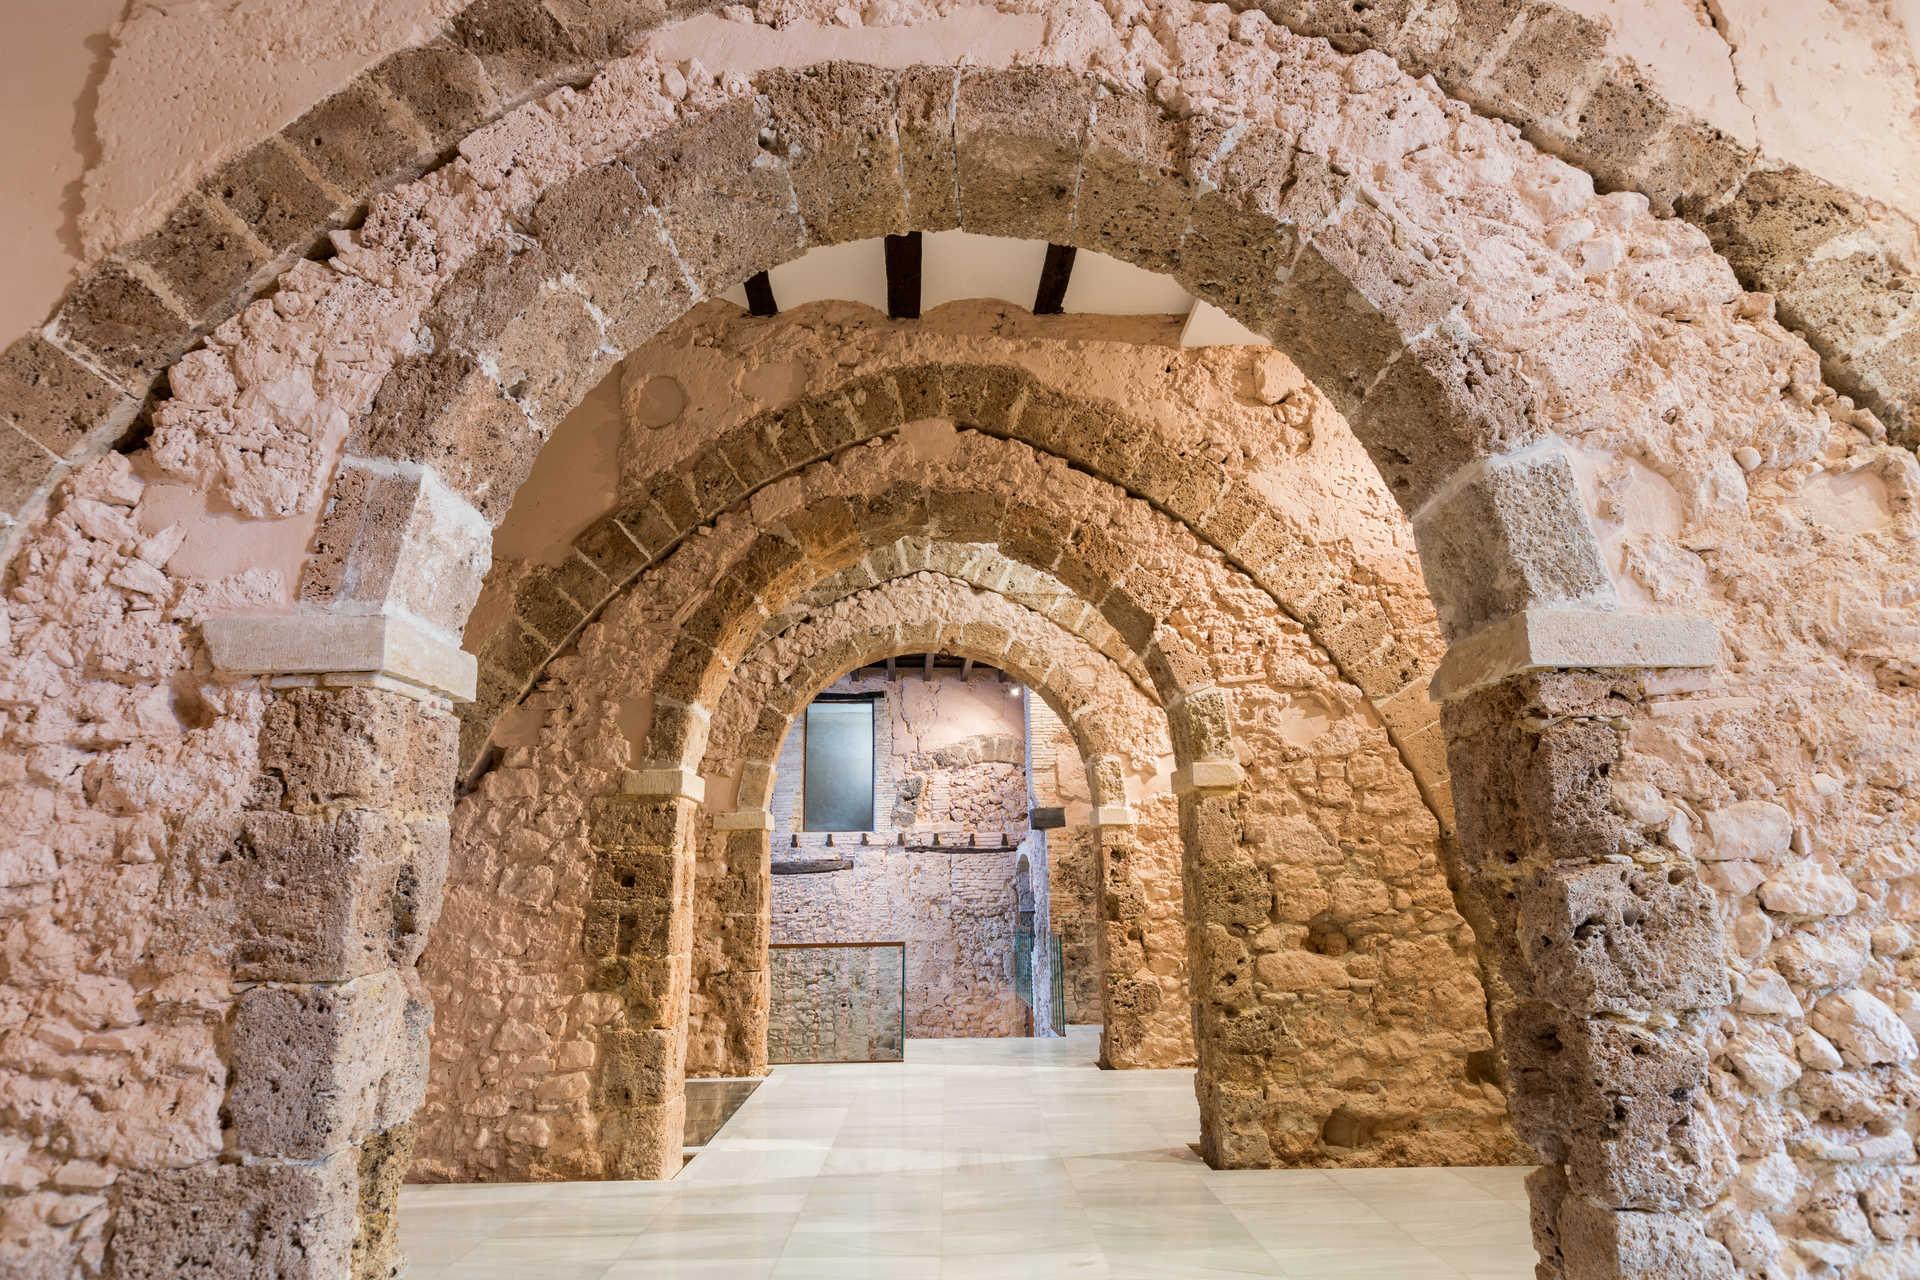 CASTLE-PALACE OF THE MILÁN DE ARAGÓN FAMILY (MARQUISES OF ALBAIDA)